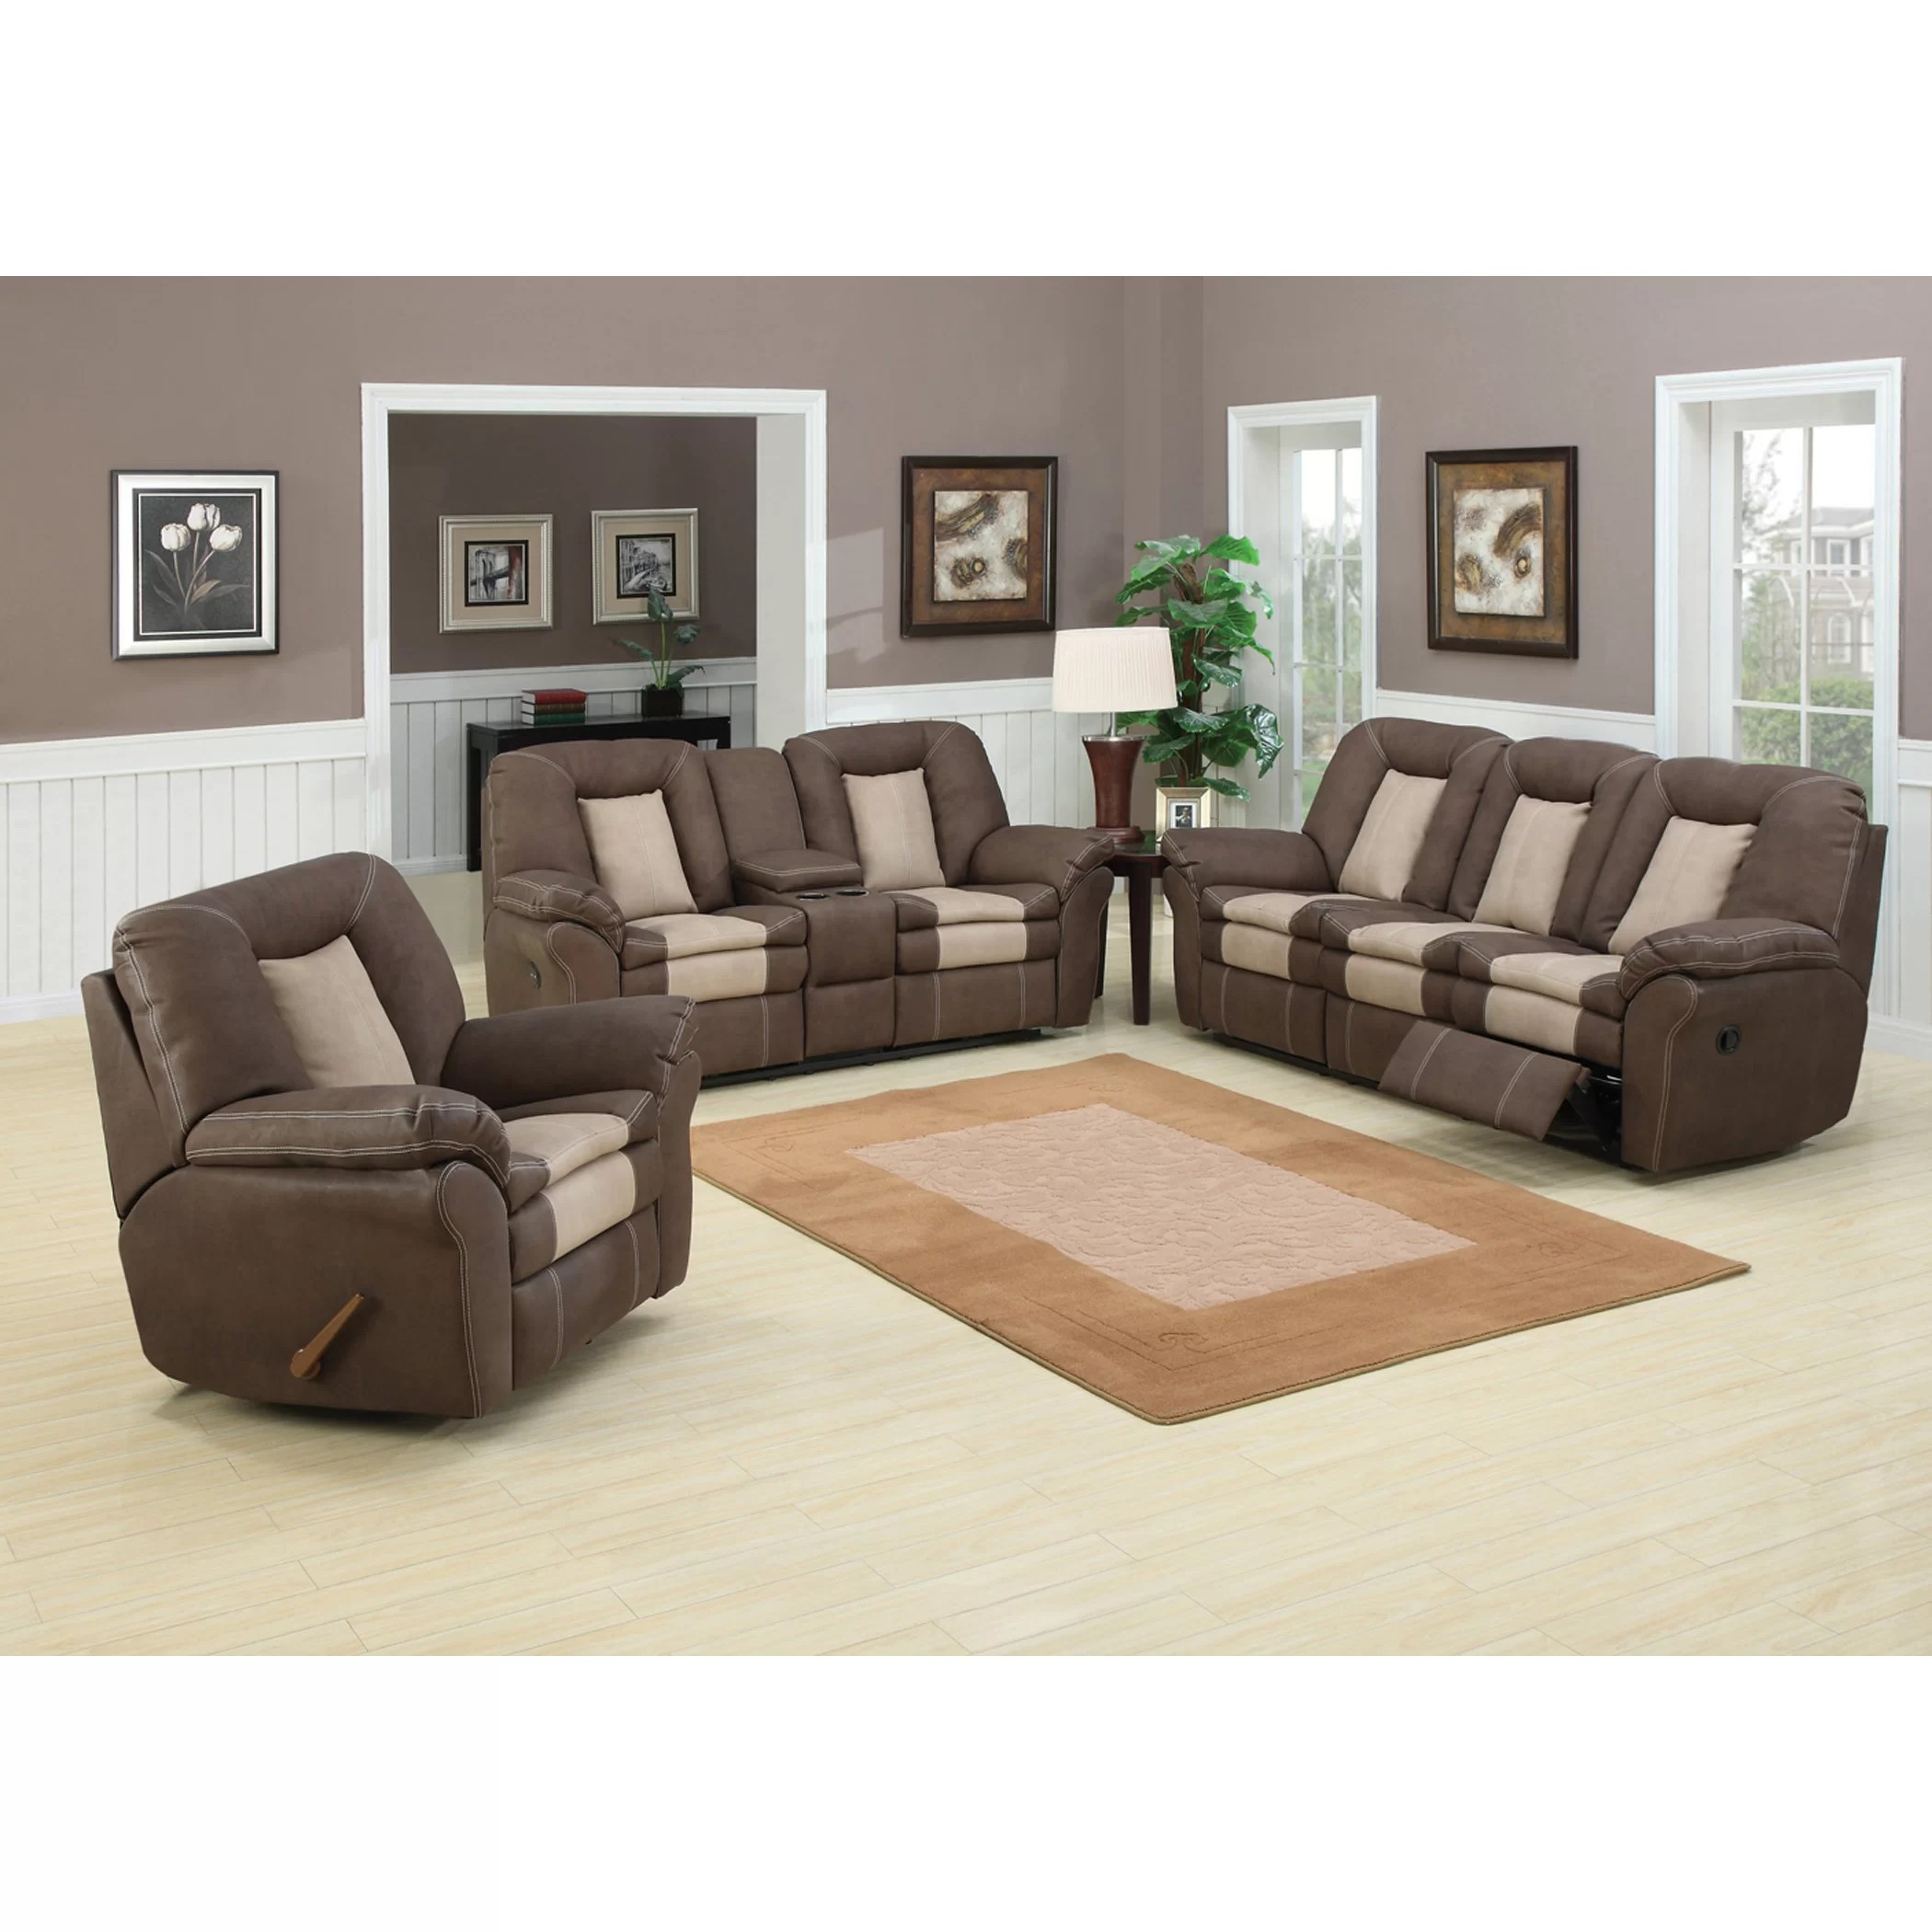 plush zara sofa review velvet chesterfield ac pacific carson living room dual reclining